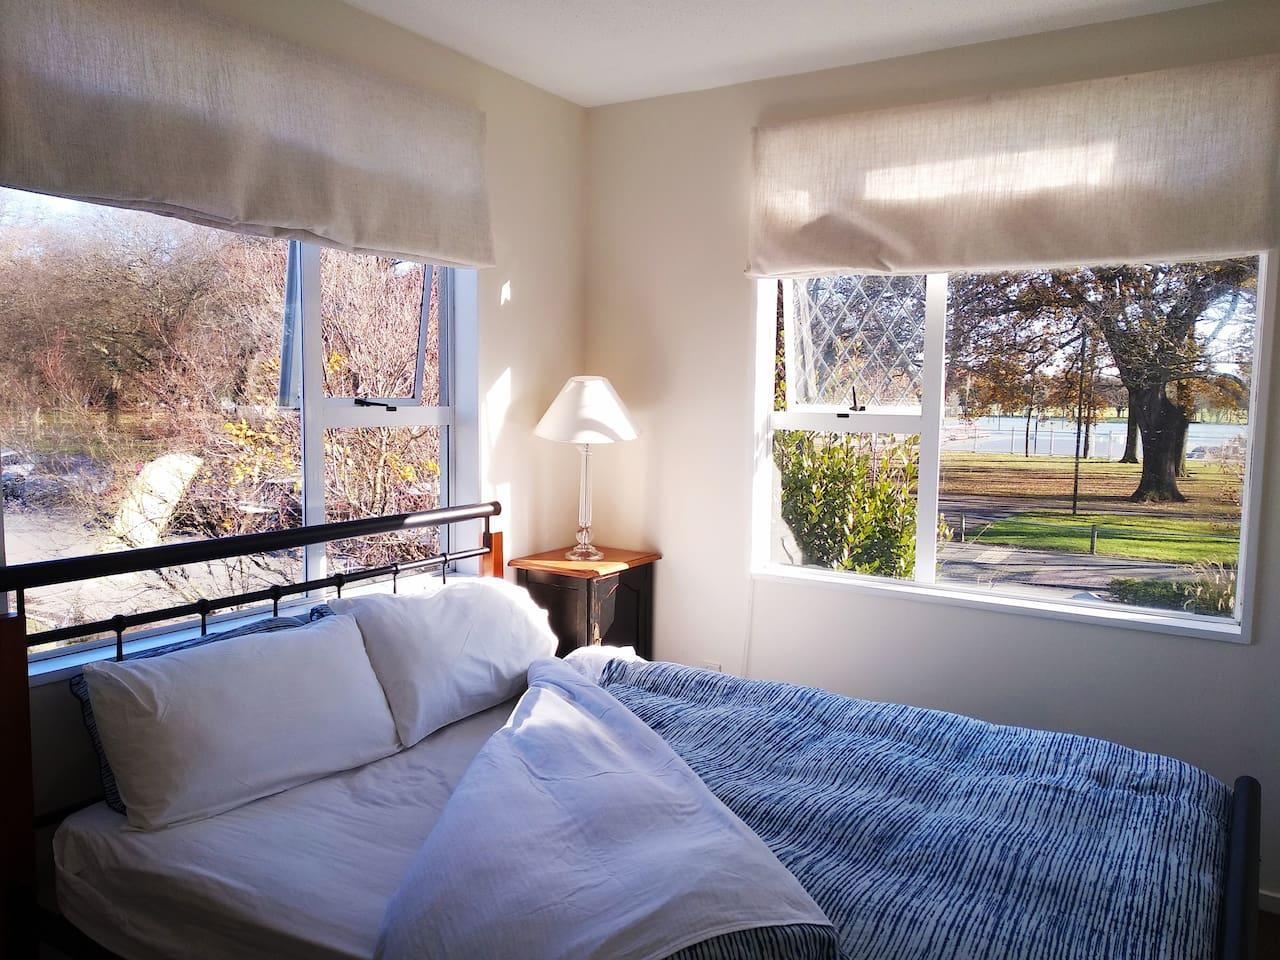 Sunny room, queen bed, cosy bedding and Hagley park views